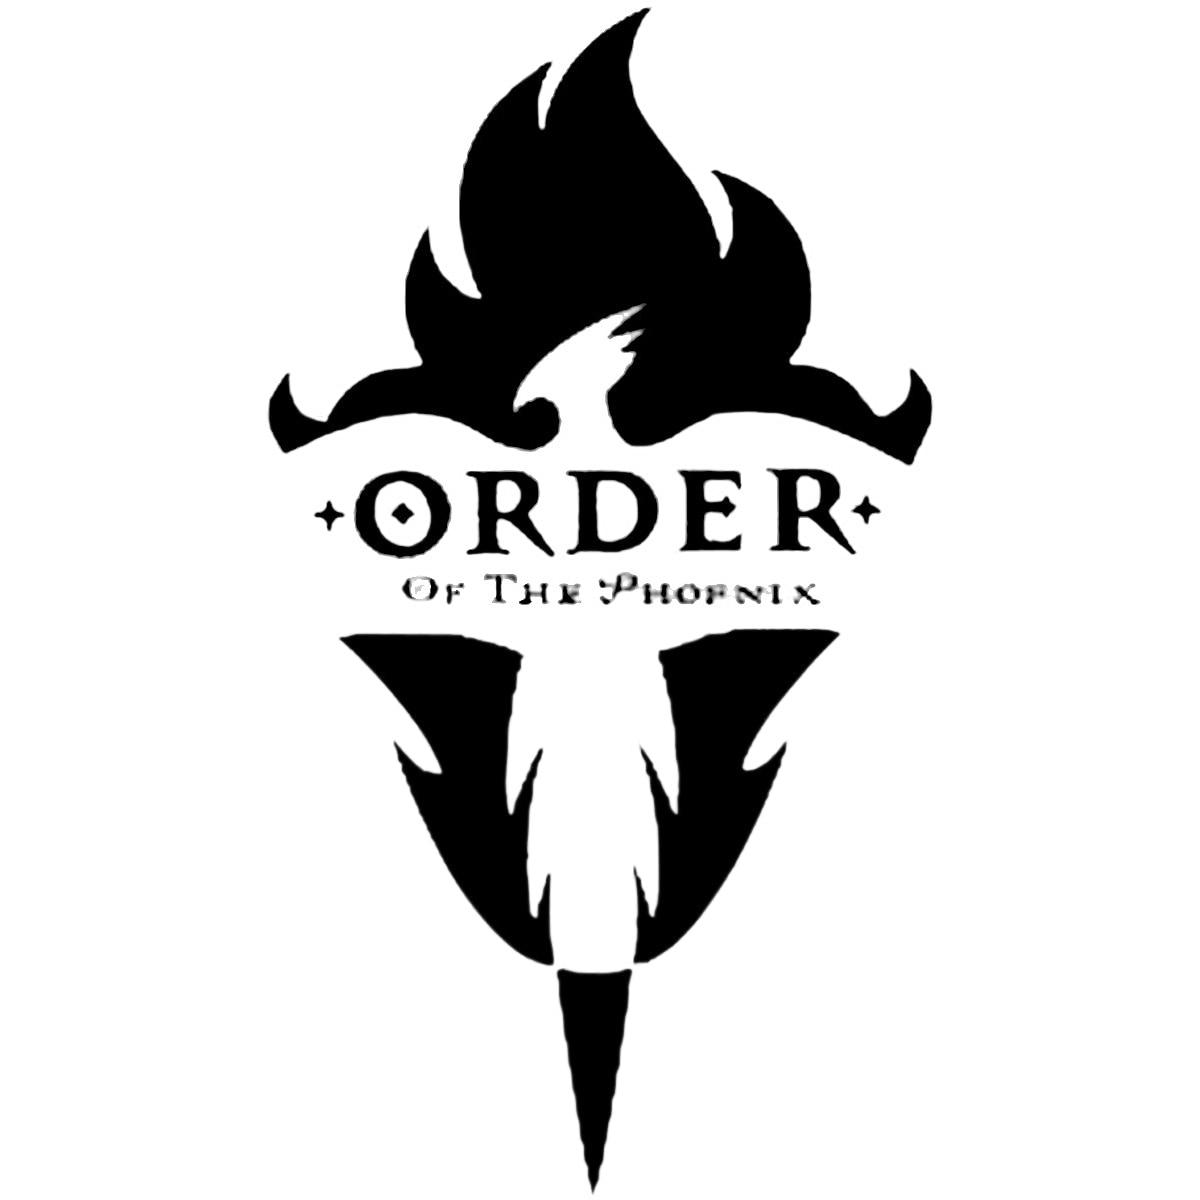 Jordan Wall Sticker Harry Potter Order Of The Phoenix Cosplay Tattoo For Body